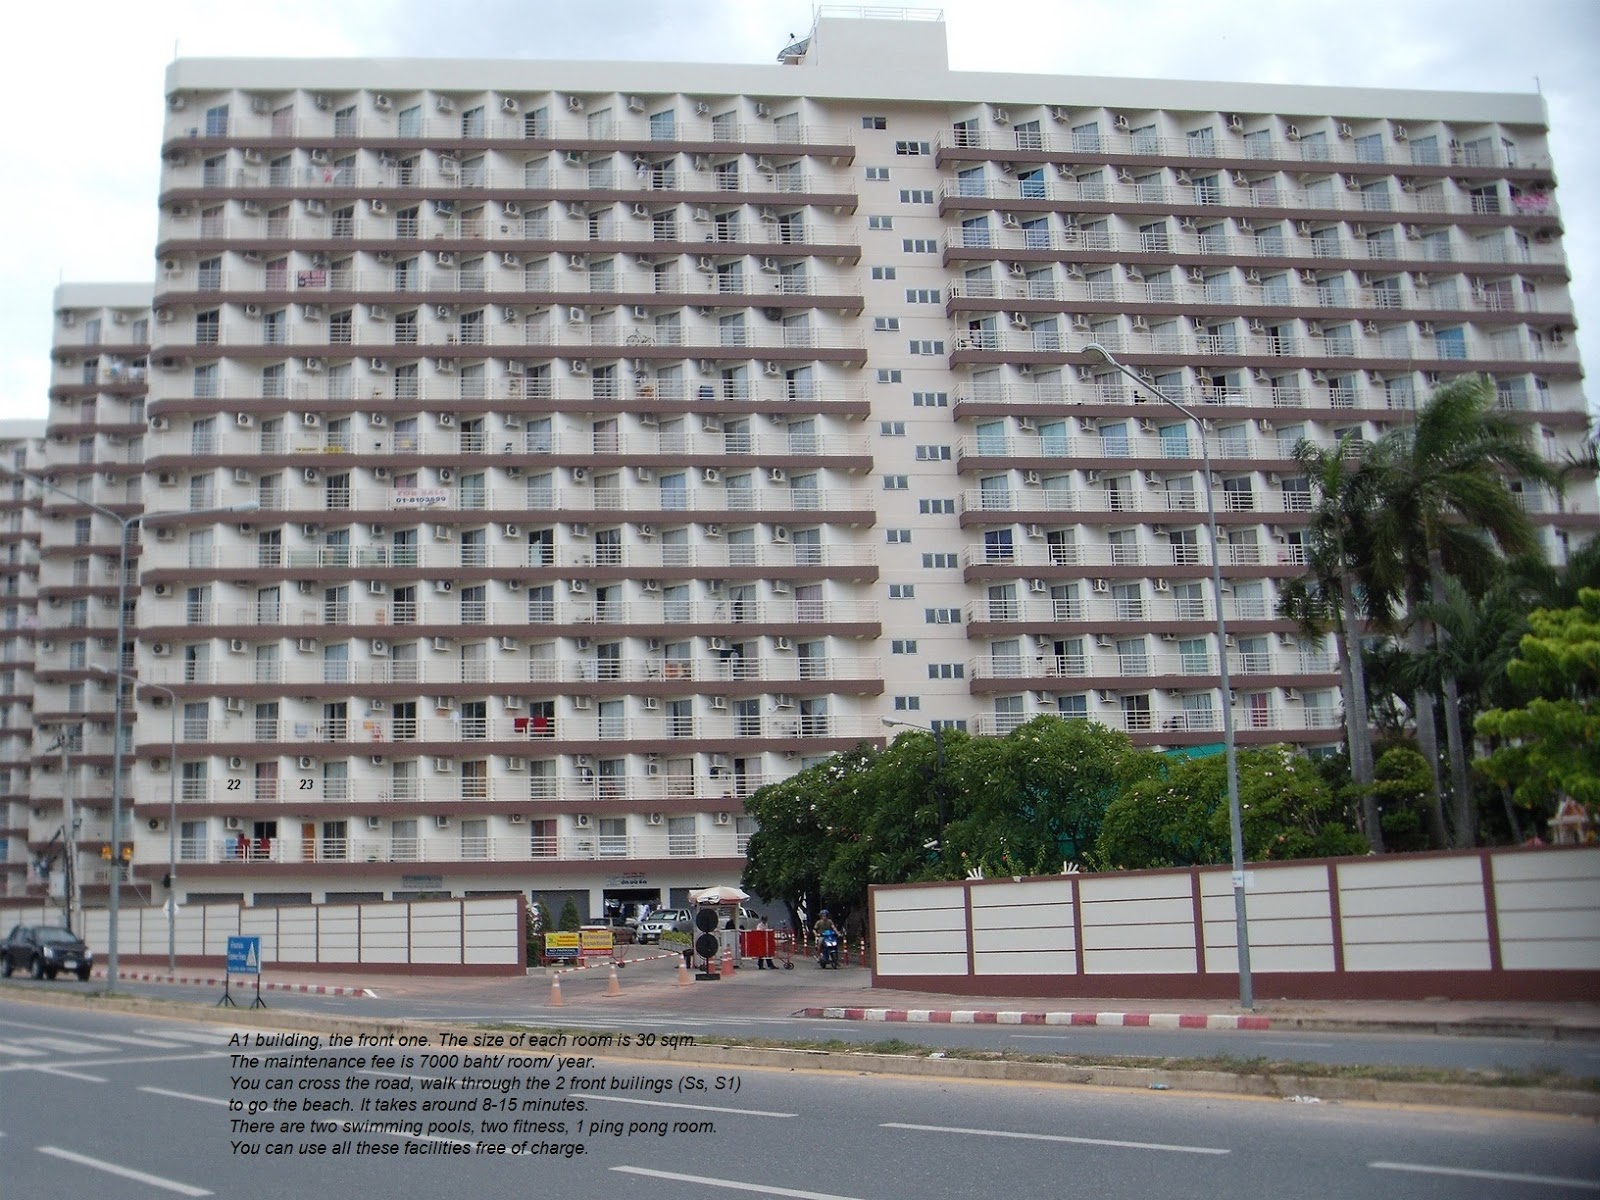 Jomtien Beach Condominium for rent  long term or short term rent. Jomtien Beach Condominium for rent  Jomtien Beach Condo is the